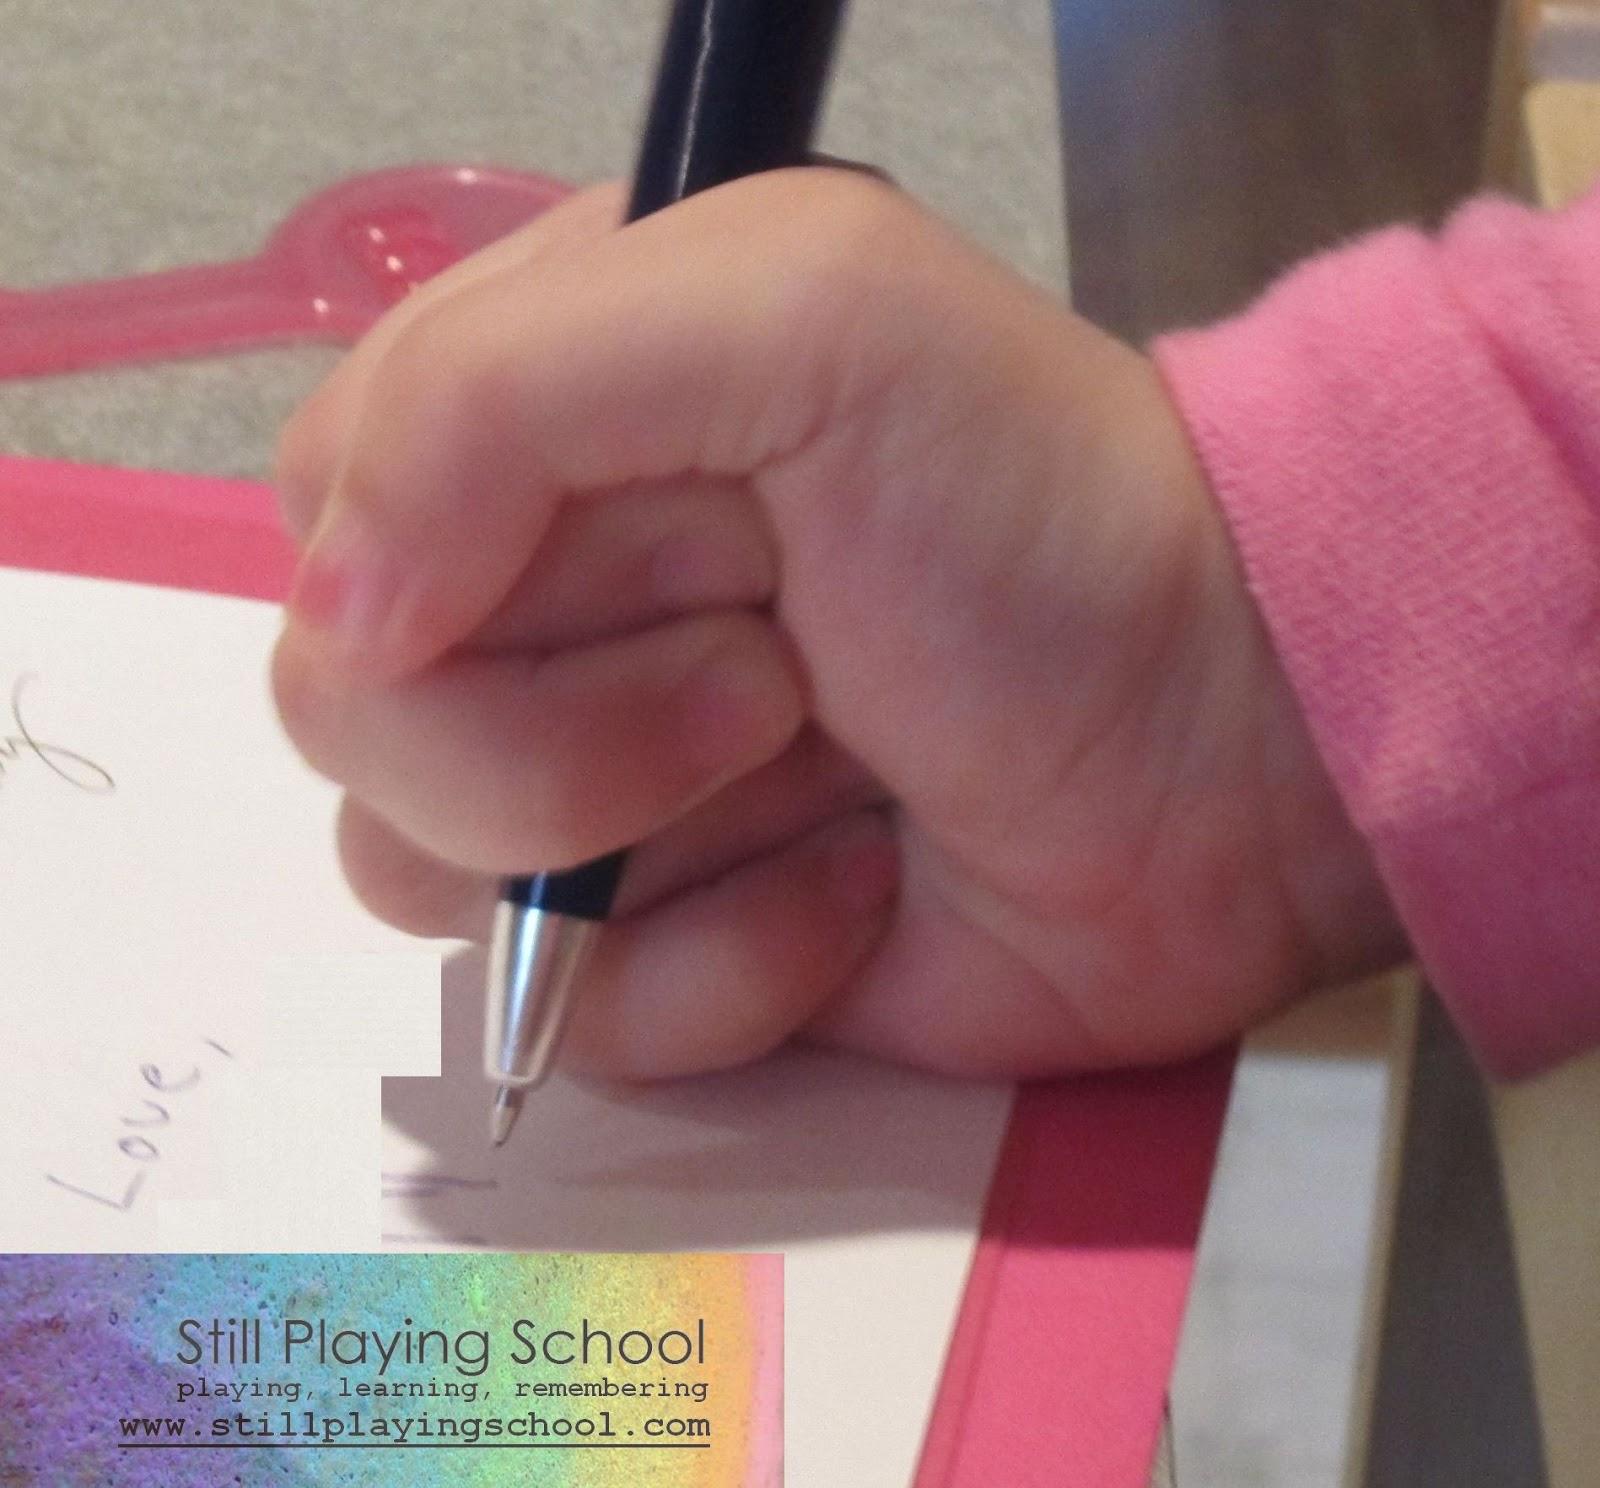 Fist grip pencil